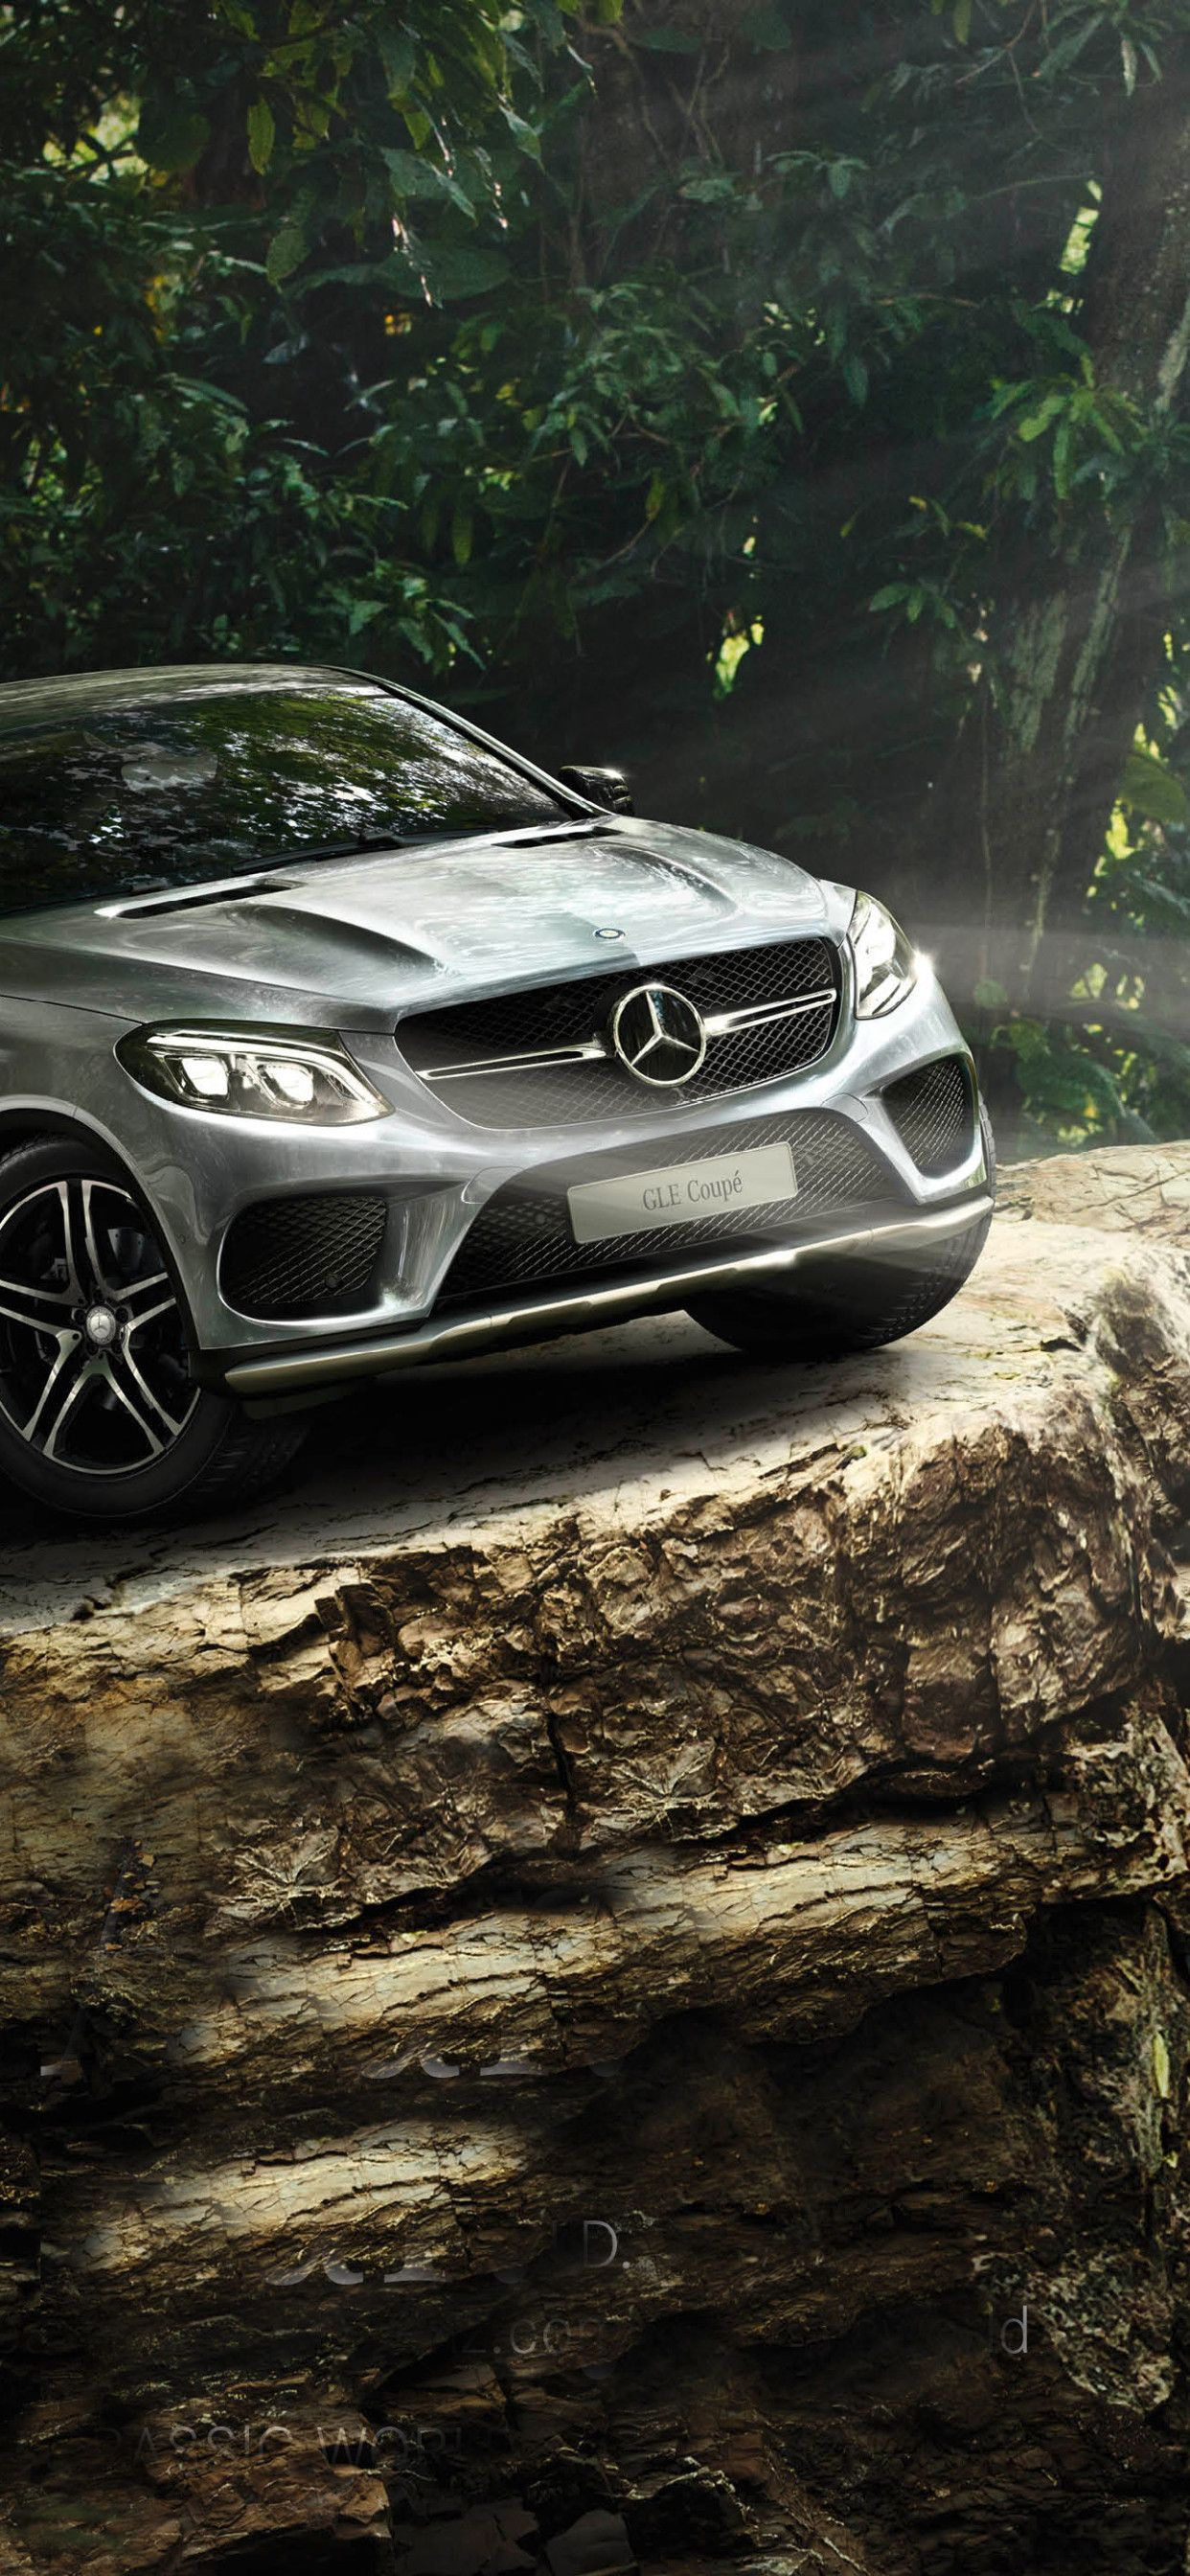 Mercedes Benz 4k iPhone Wallpapers - Wallpaper Cave